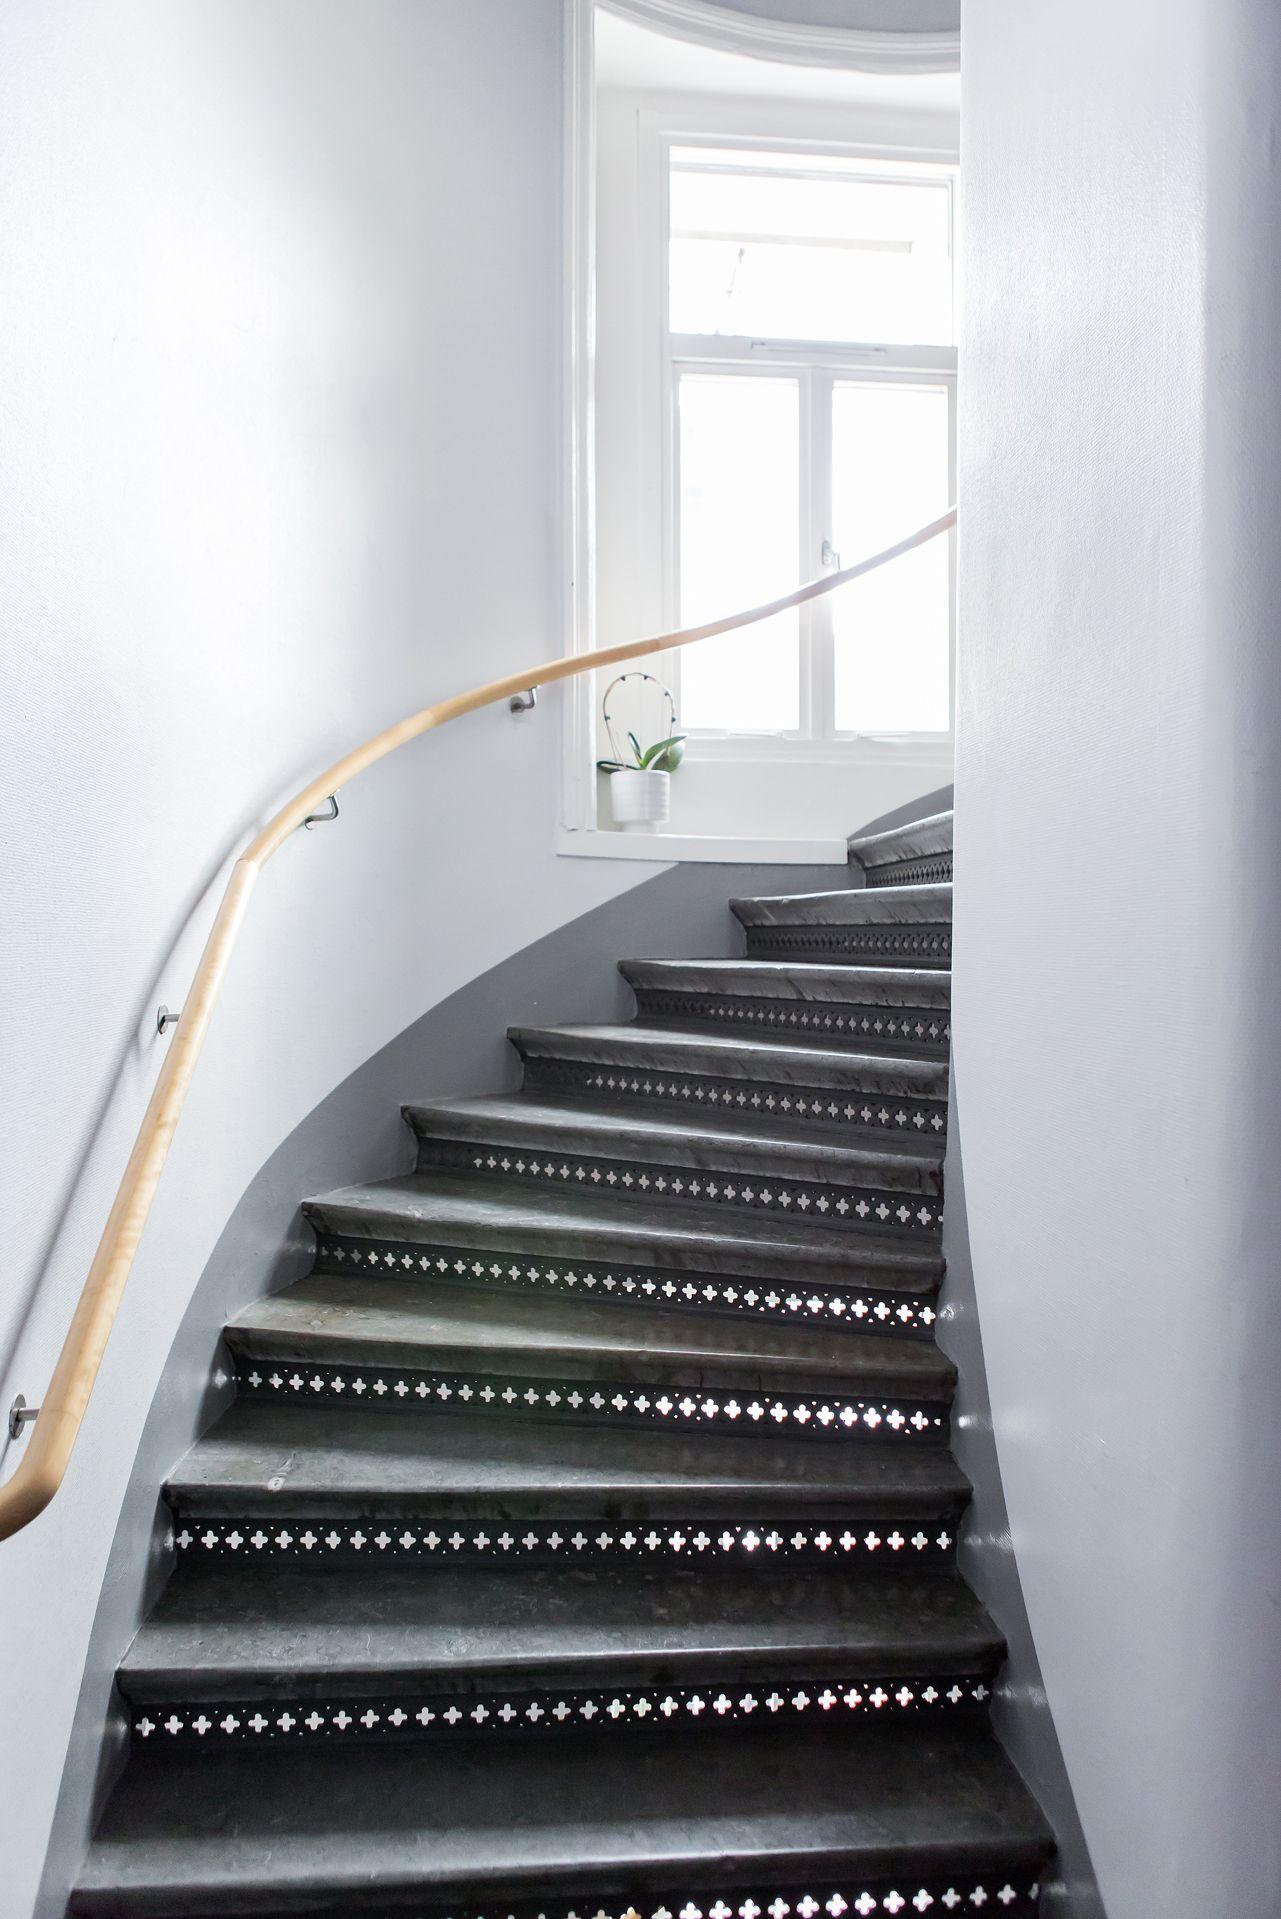 Via Alvhem Sweet Home Make Sweethomemake Interiordesign